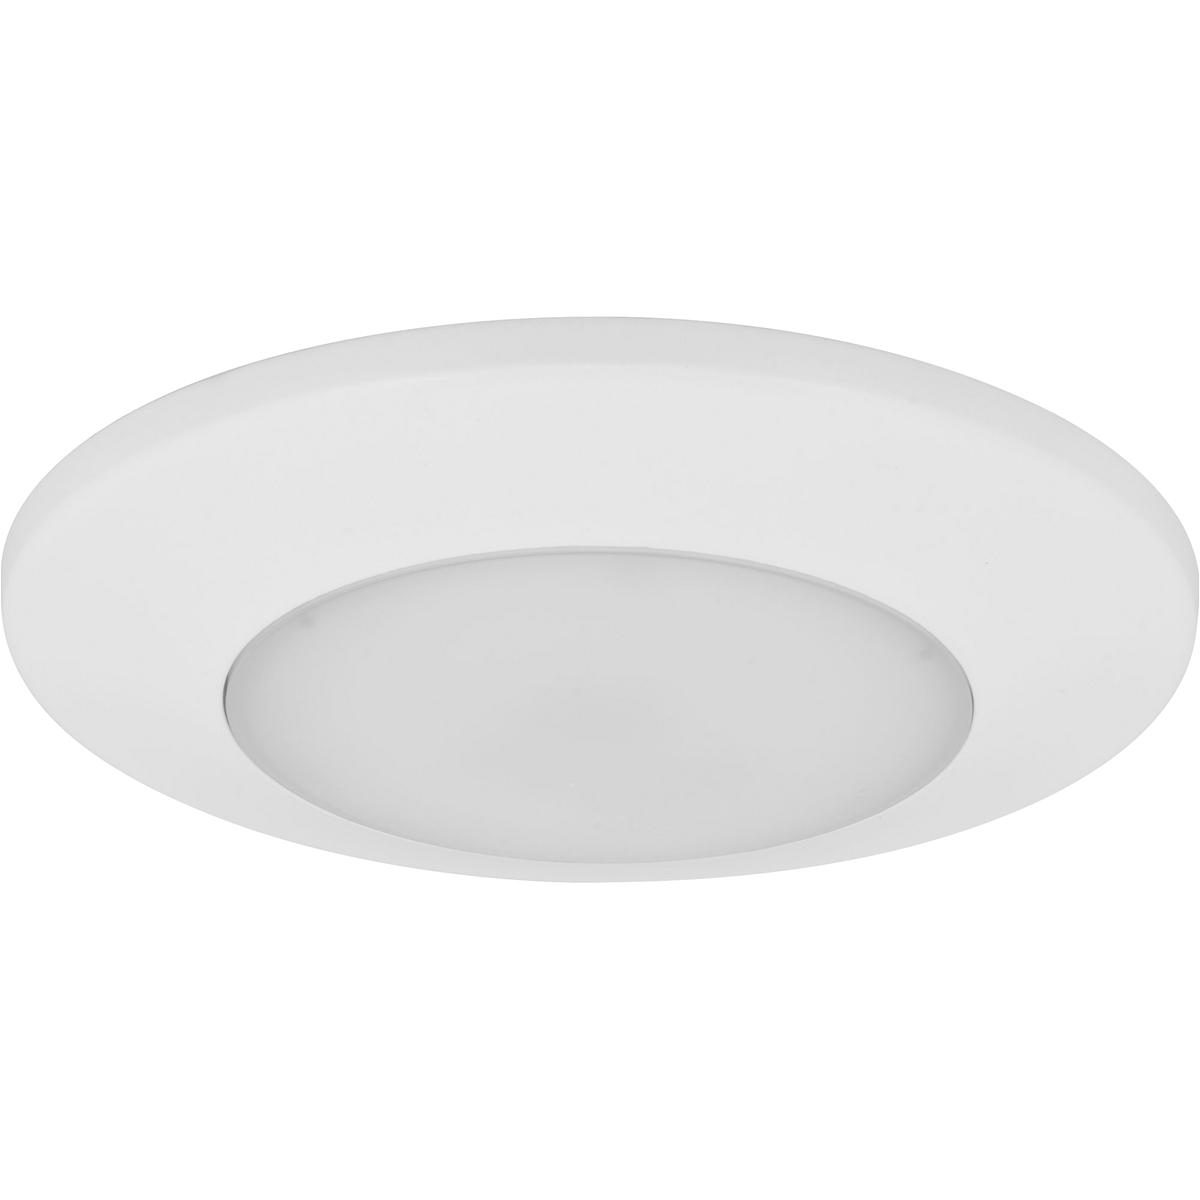 p80222830k9ac1l1 progress lighting